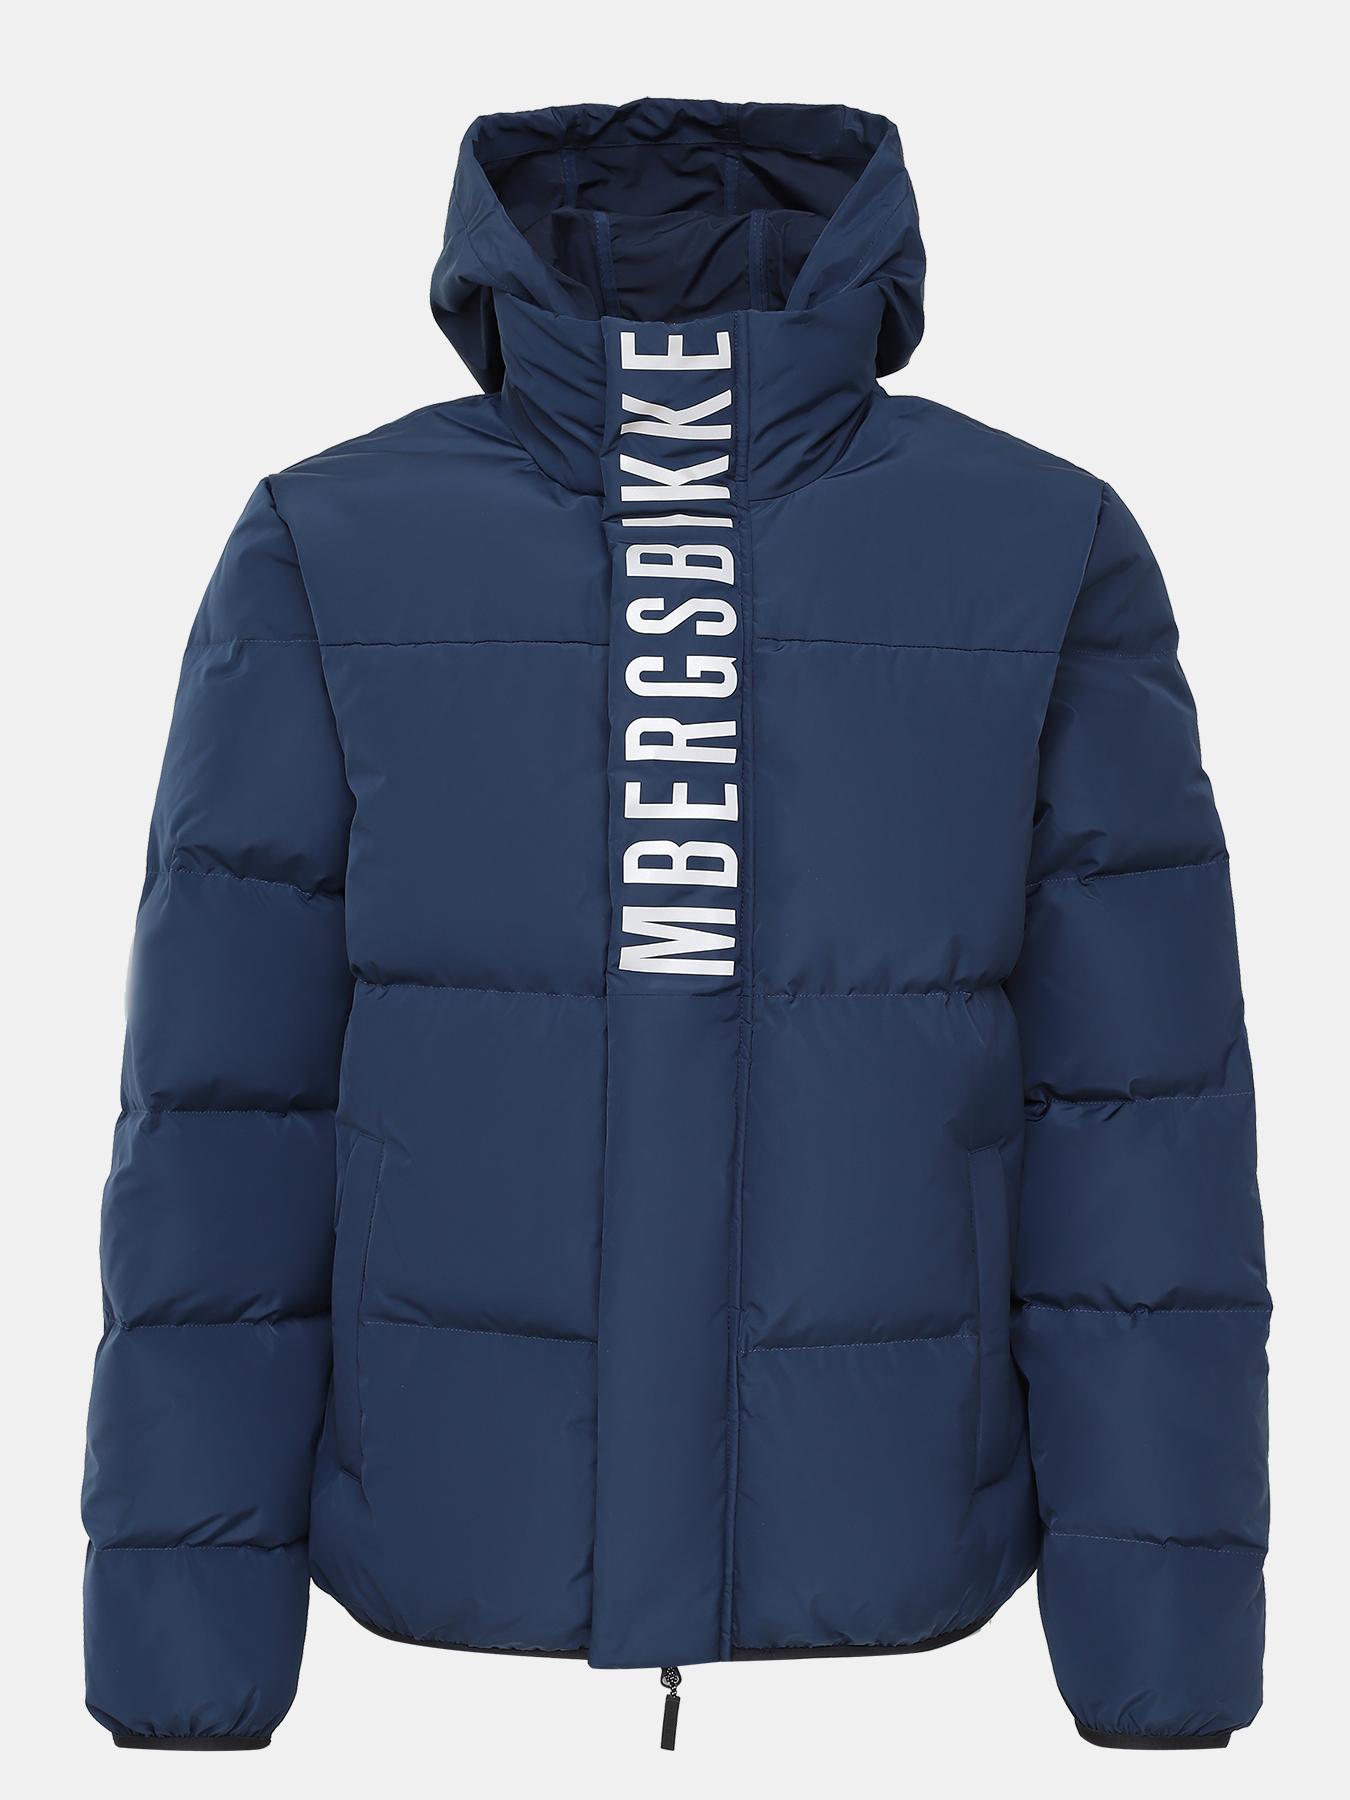 Пуховики Bikkembergs Куртка